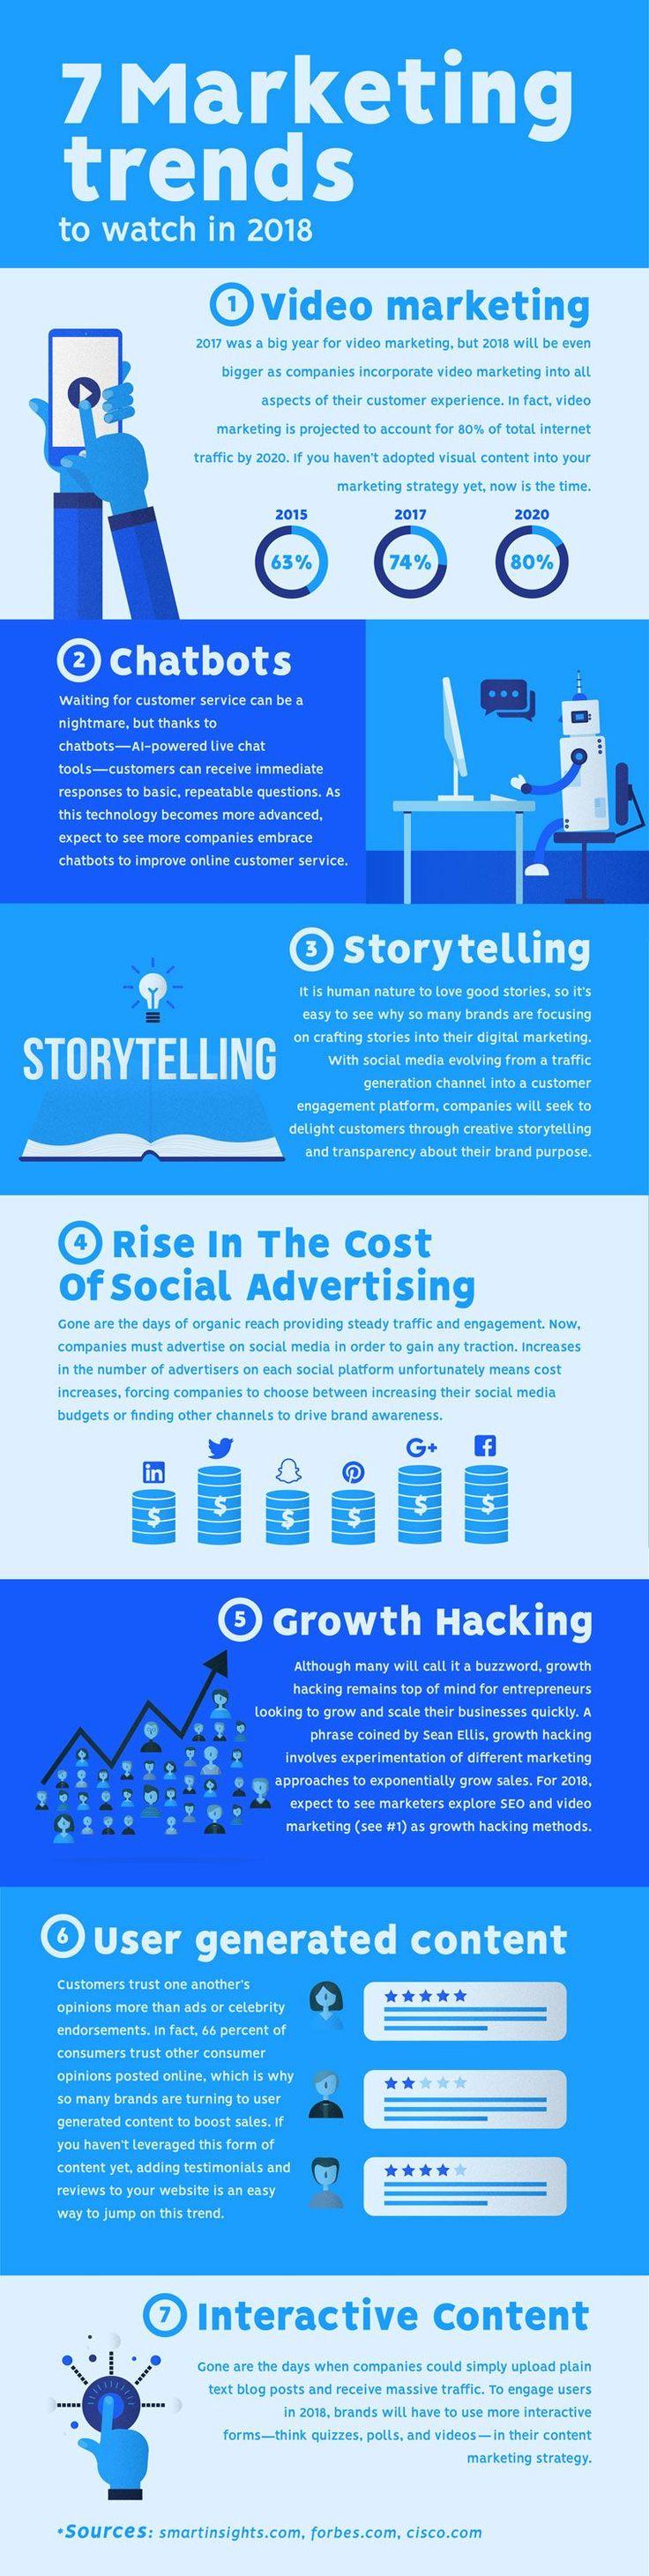 7 Digital Marketing Trends to Watch in 2018 (Infographic) #digitalmarketing